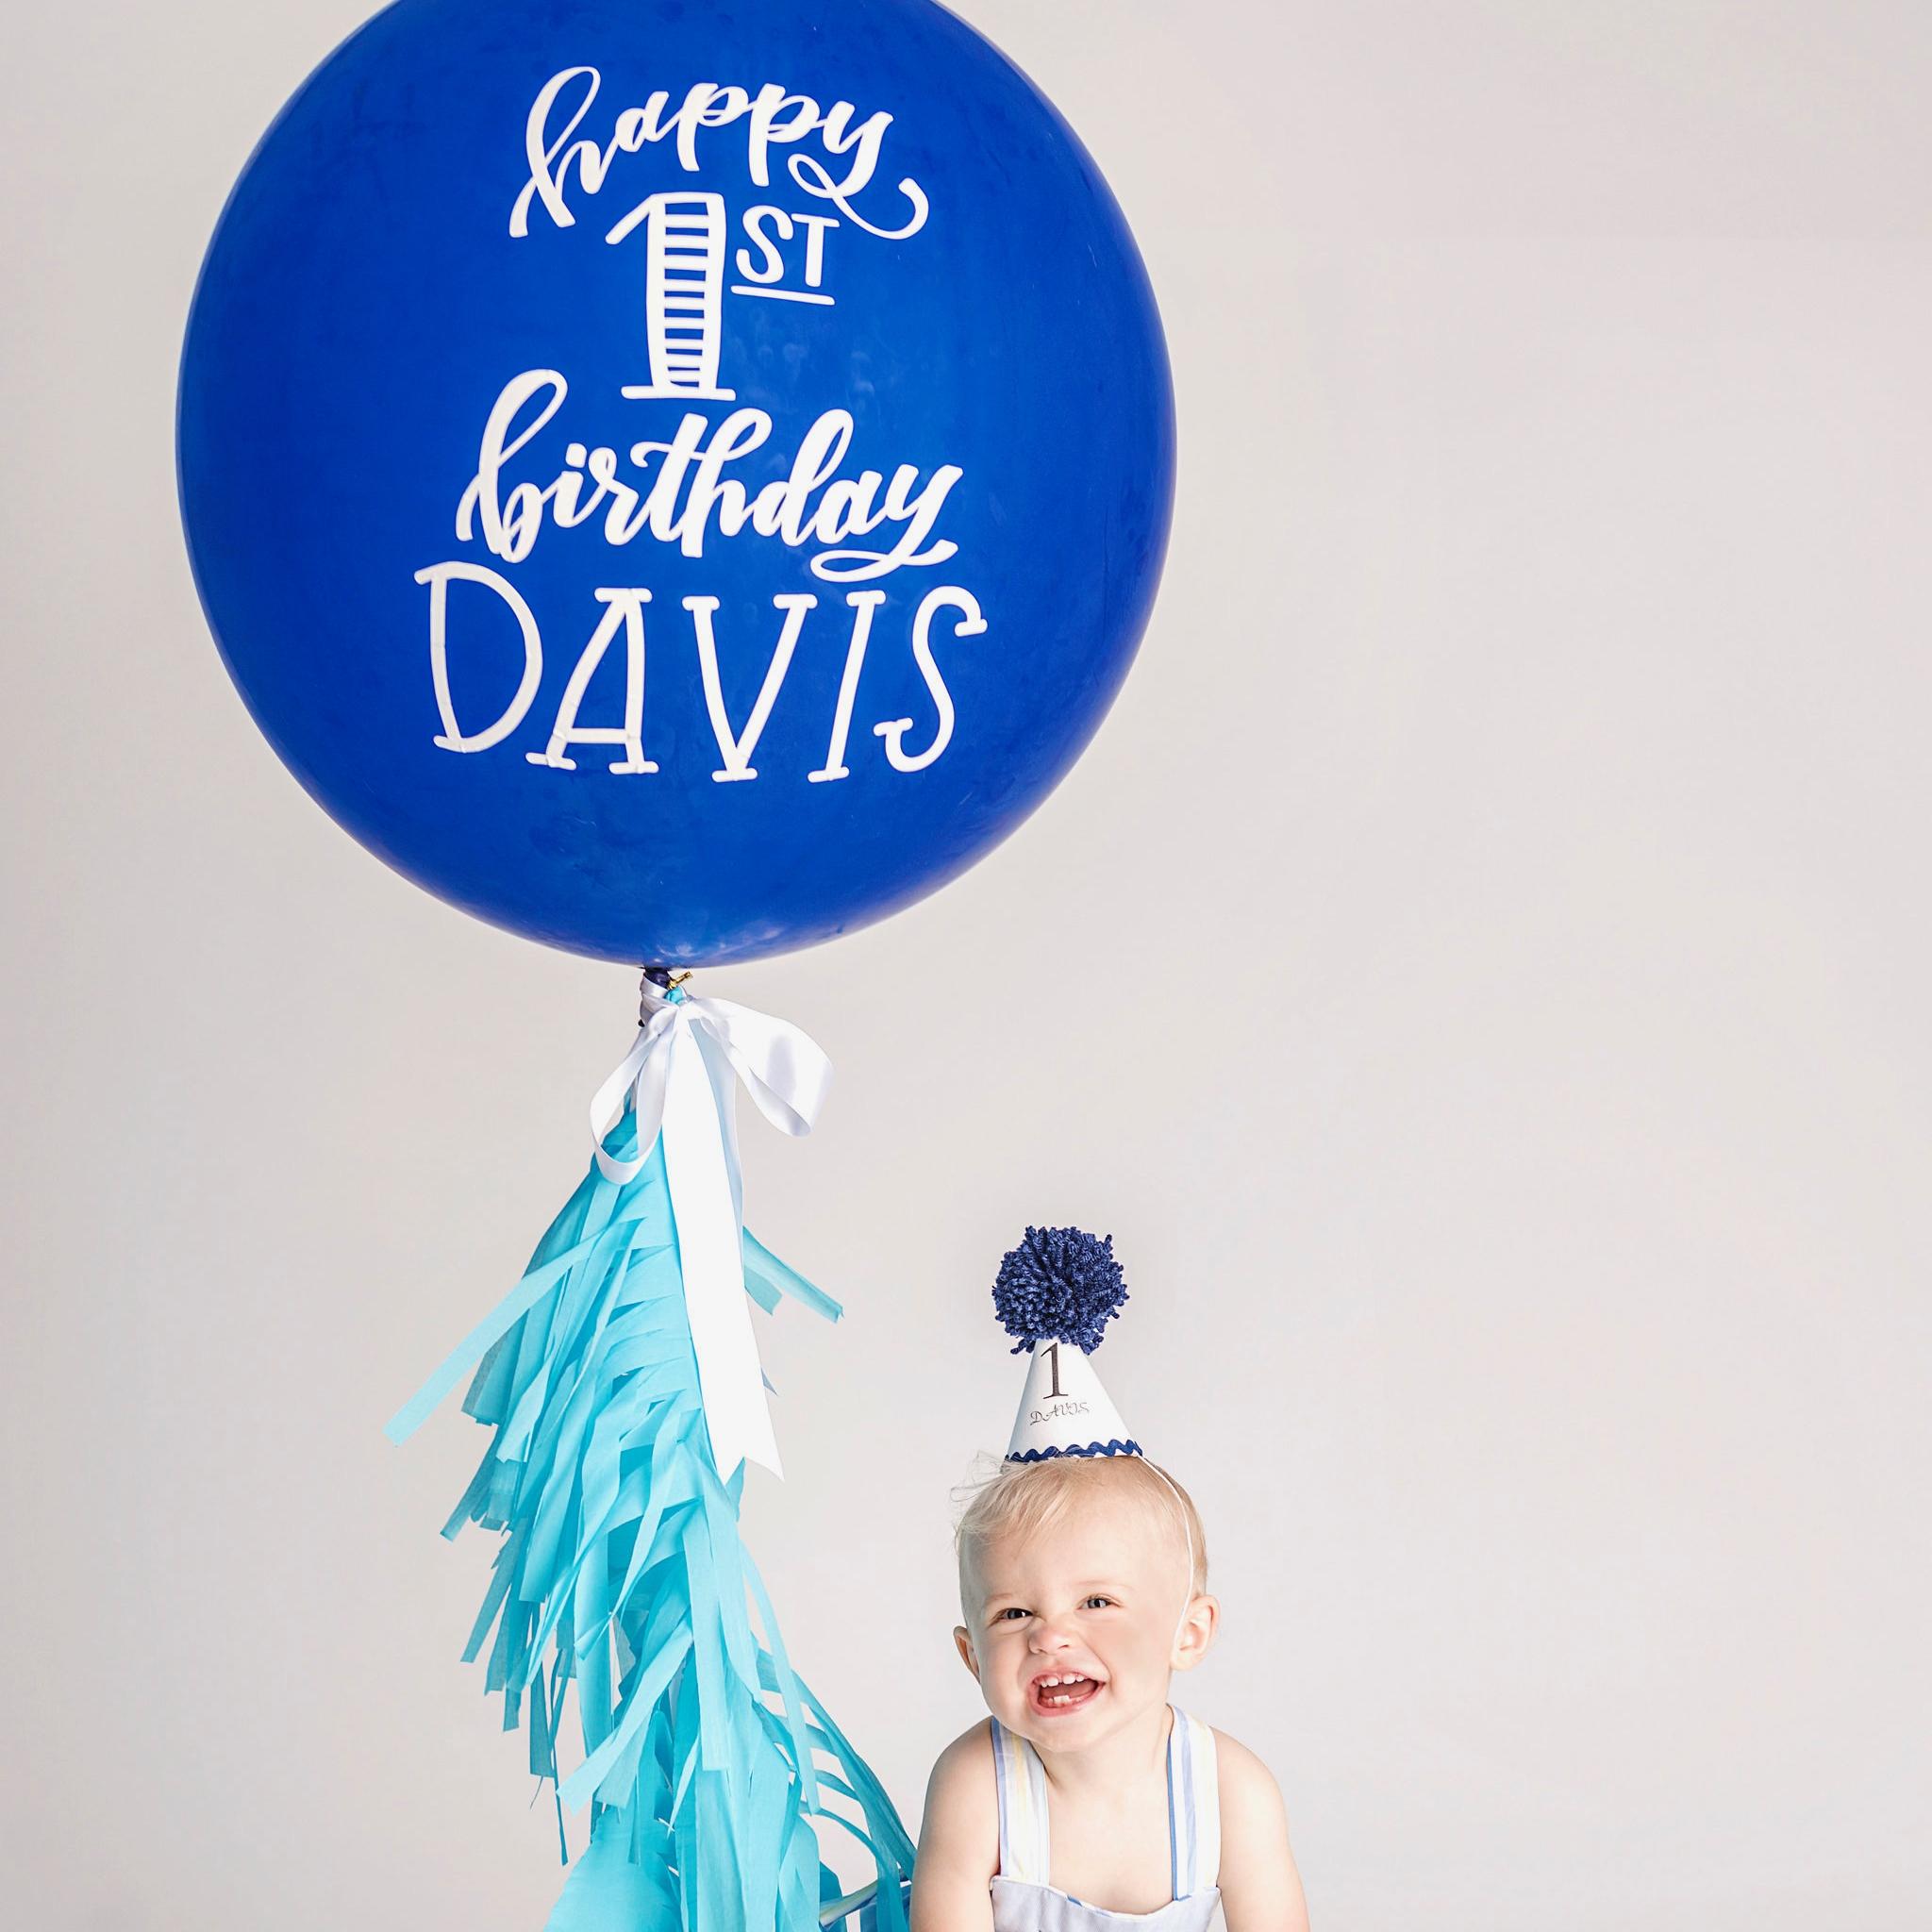 vroom_vroom_balloon_1st_birthday_davis_tassels.JPG